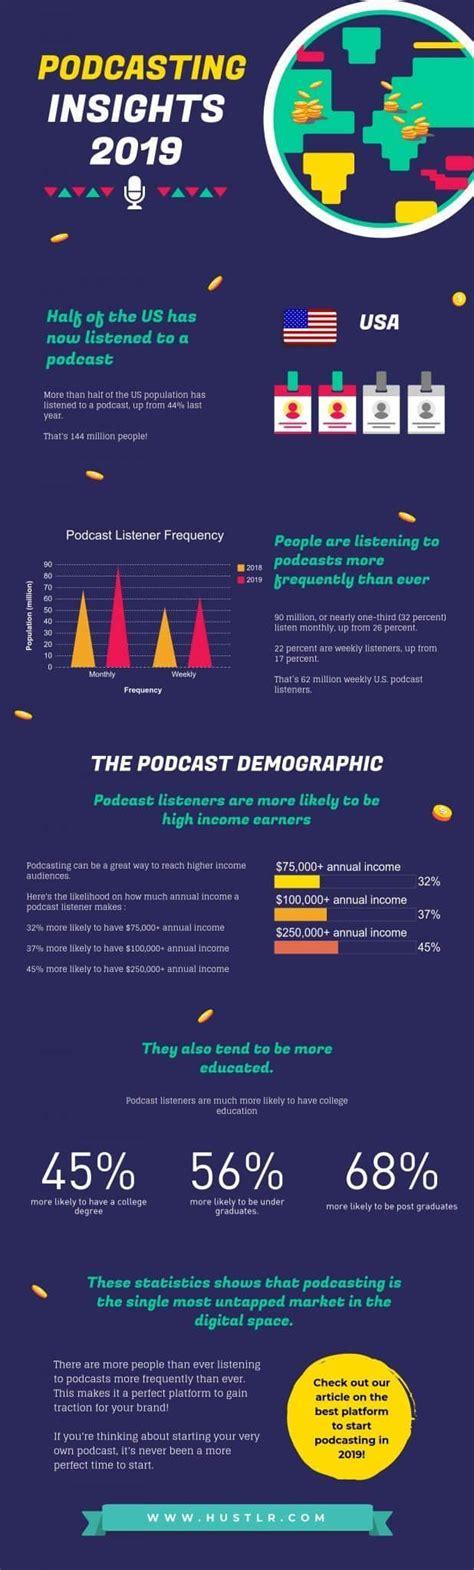 podcasting infographic insights podcast hustlr